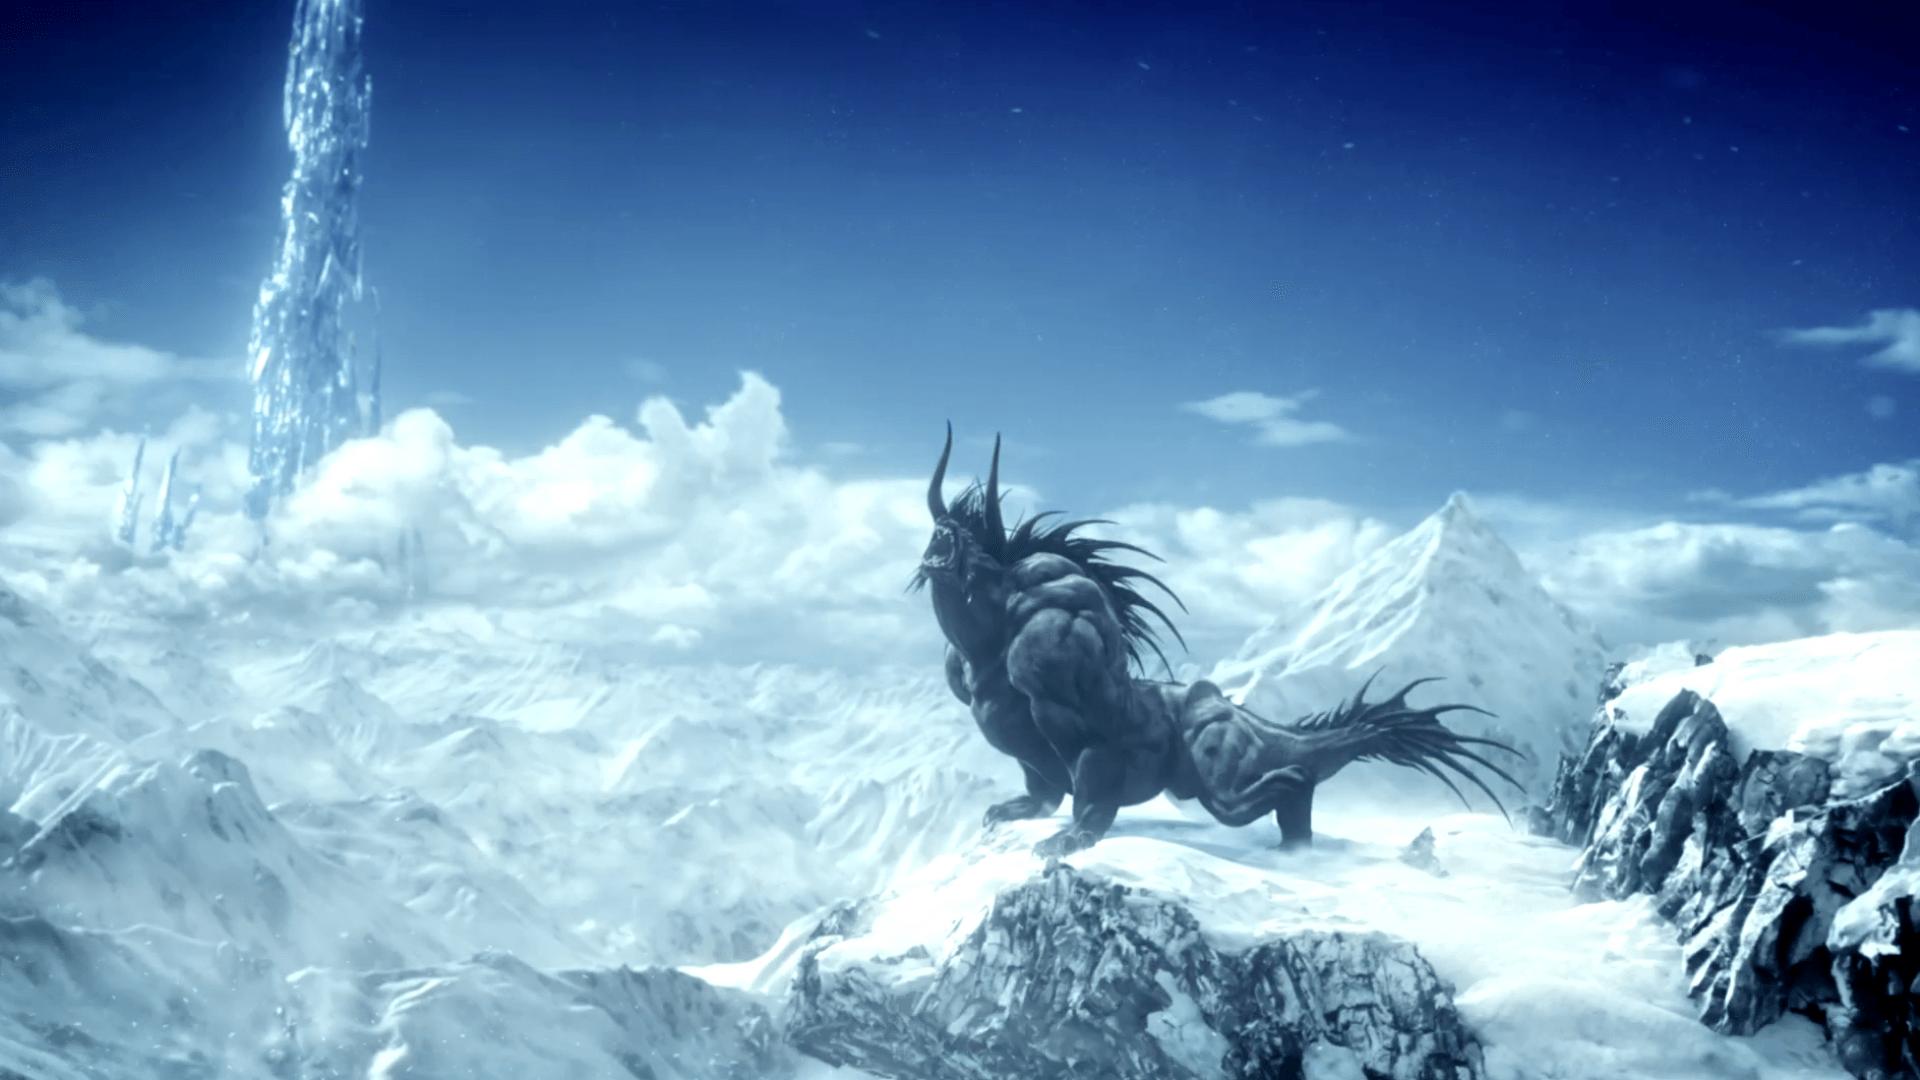 final fantasy xiv wallpaper behemoth leviathyn